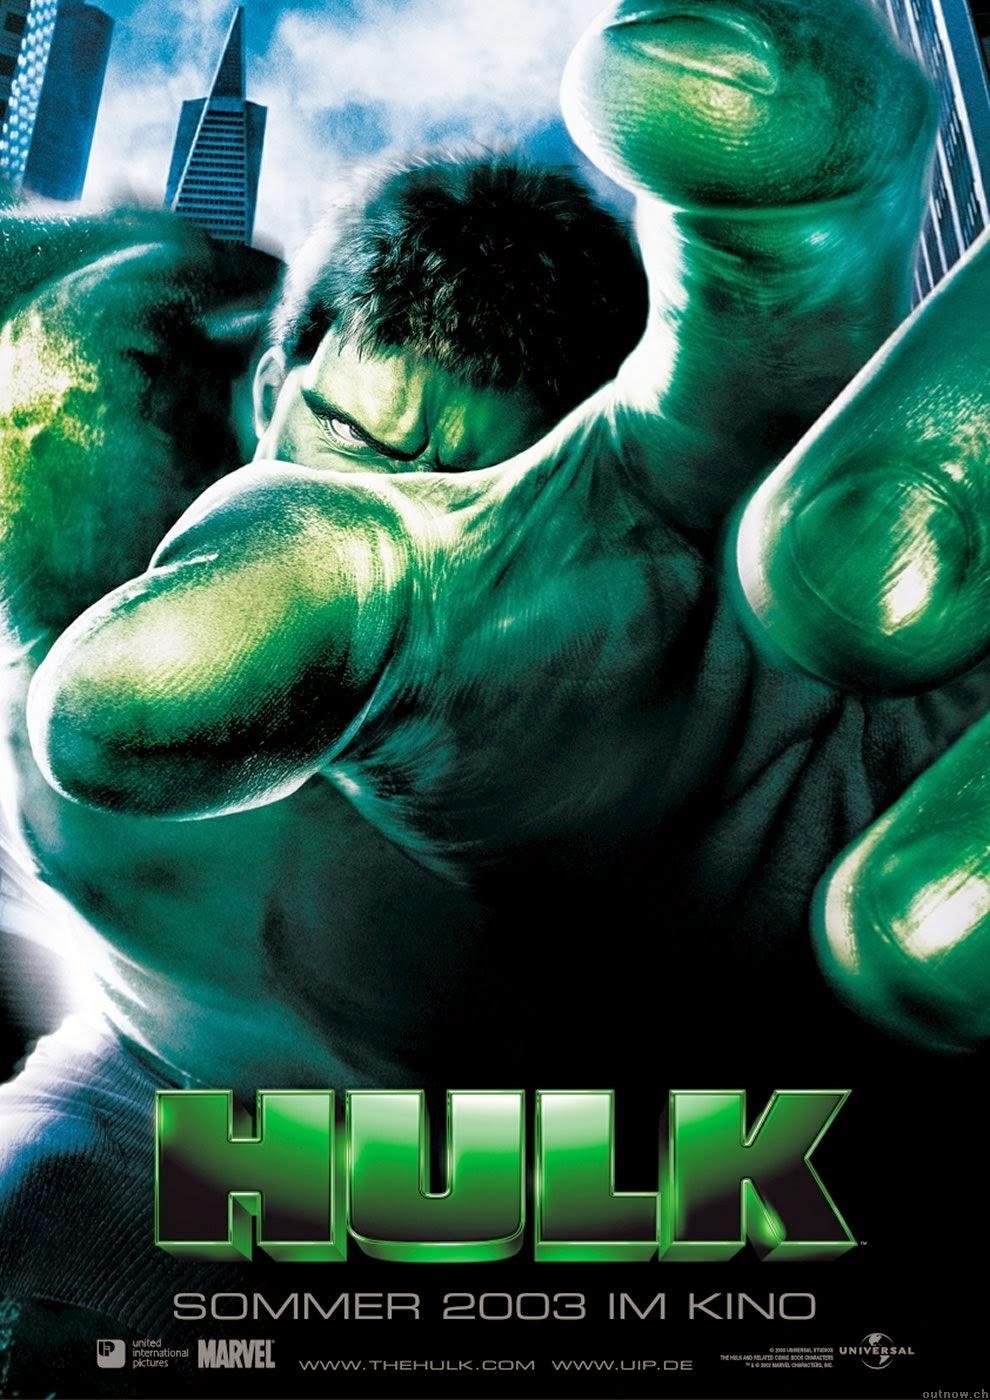 hulk 2003 games free download for pc